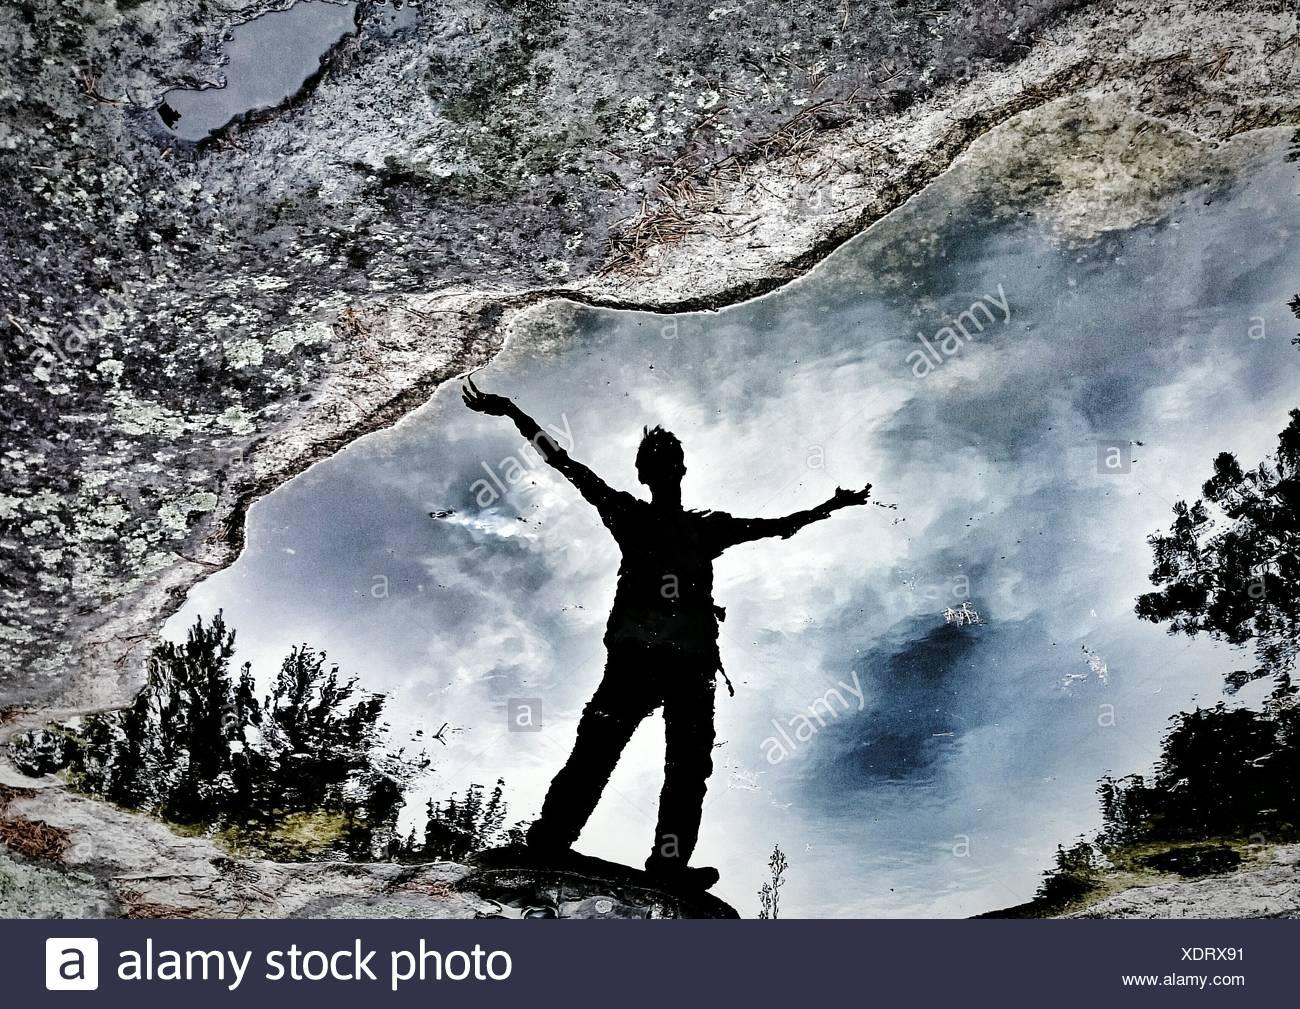 Reflection Of Man On Puddle - Stock Image